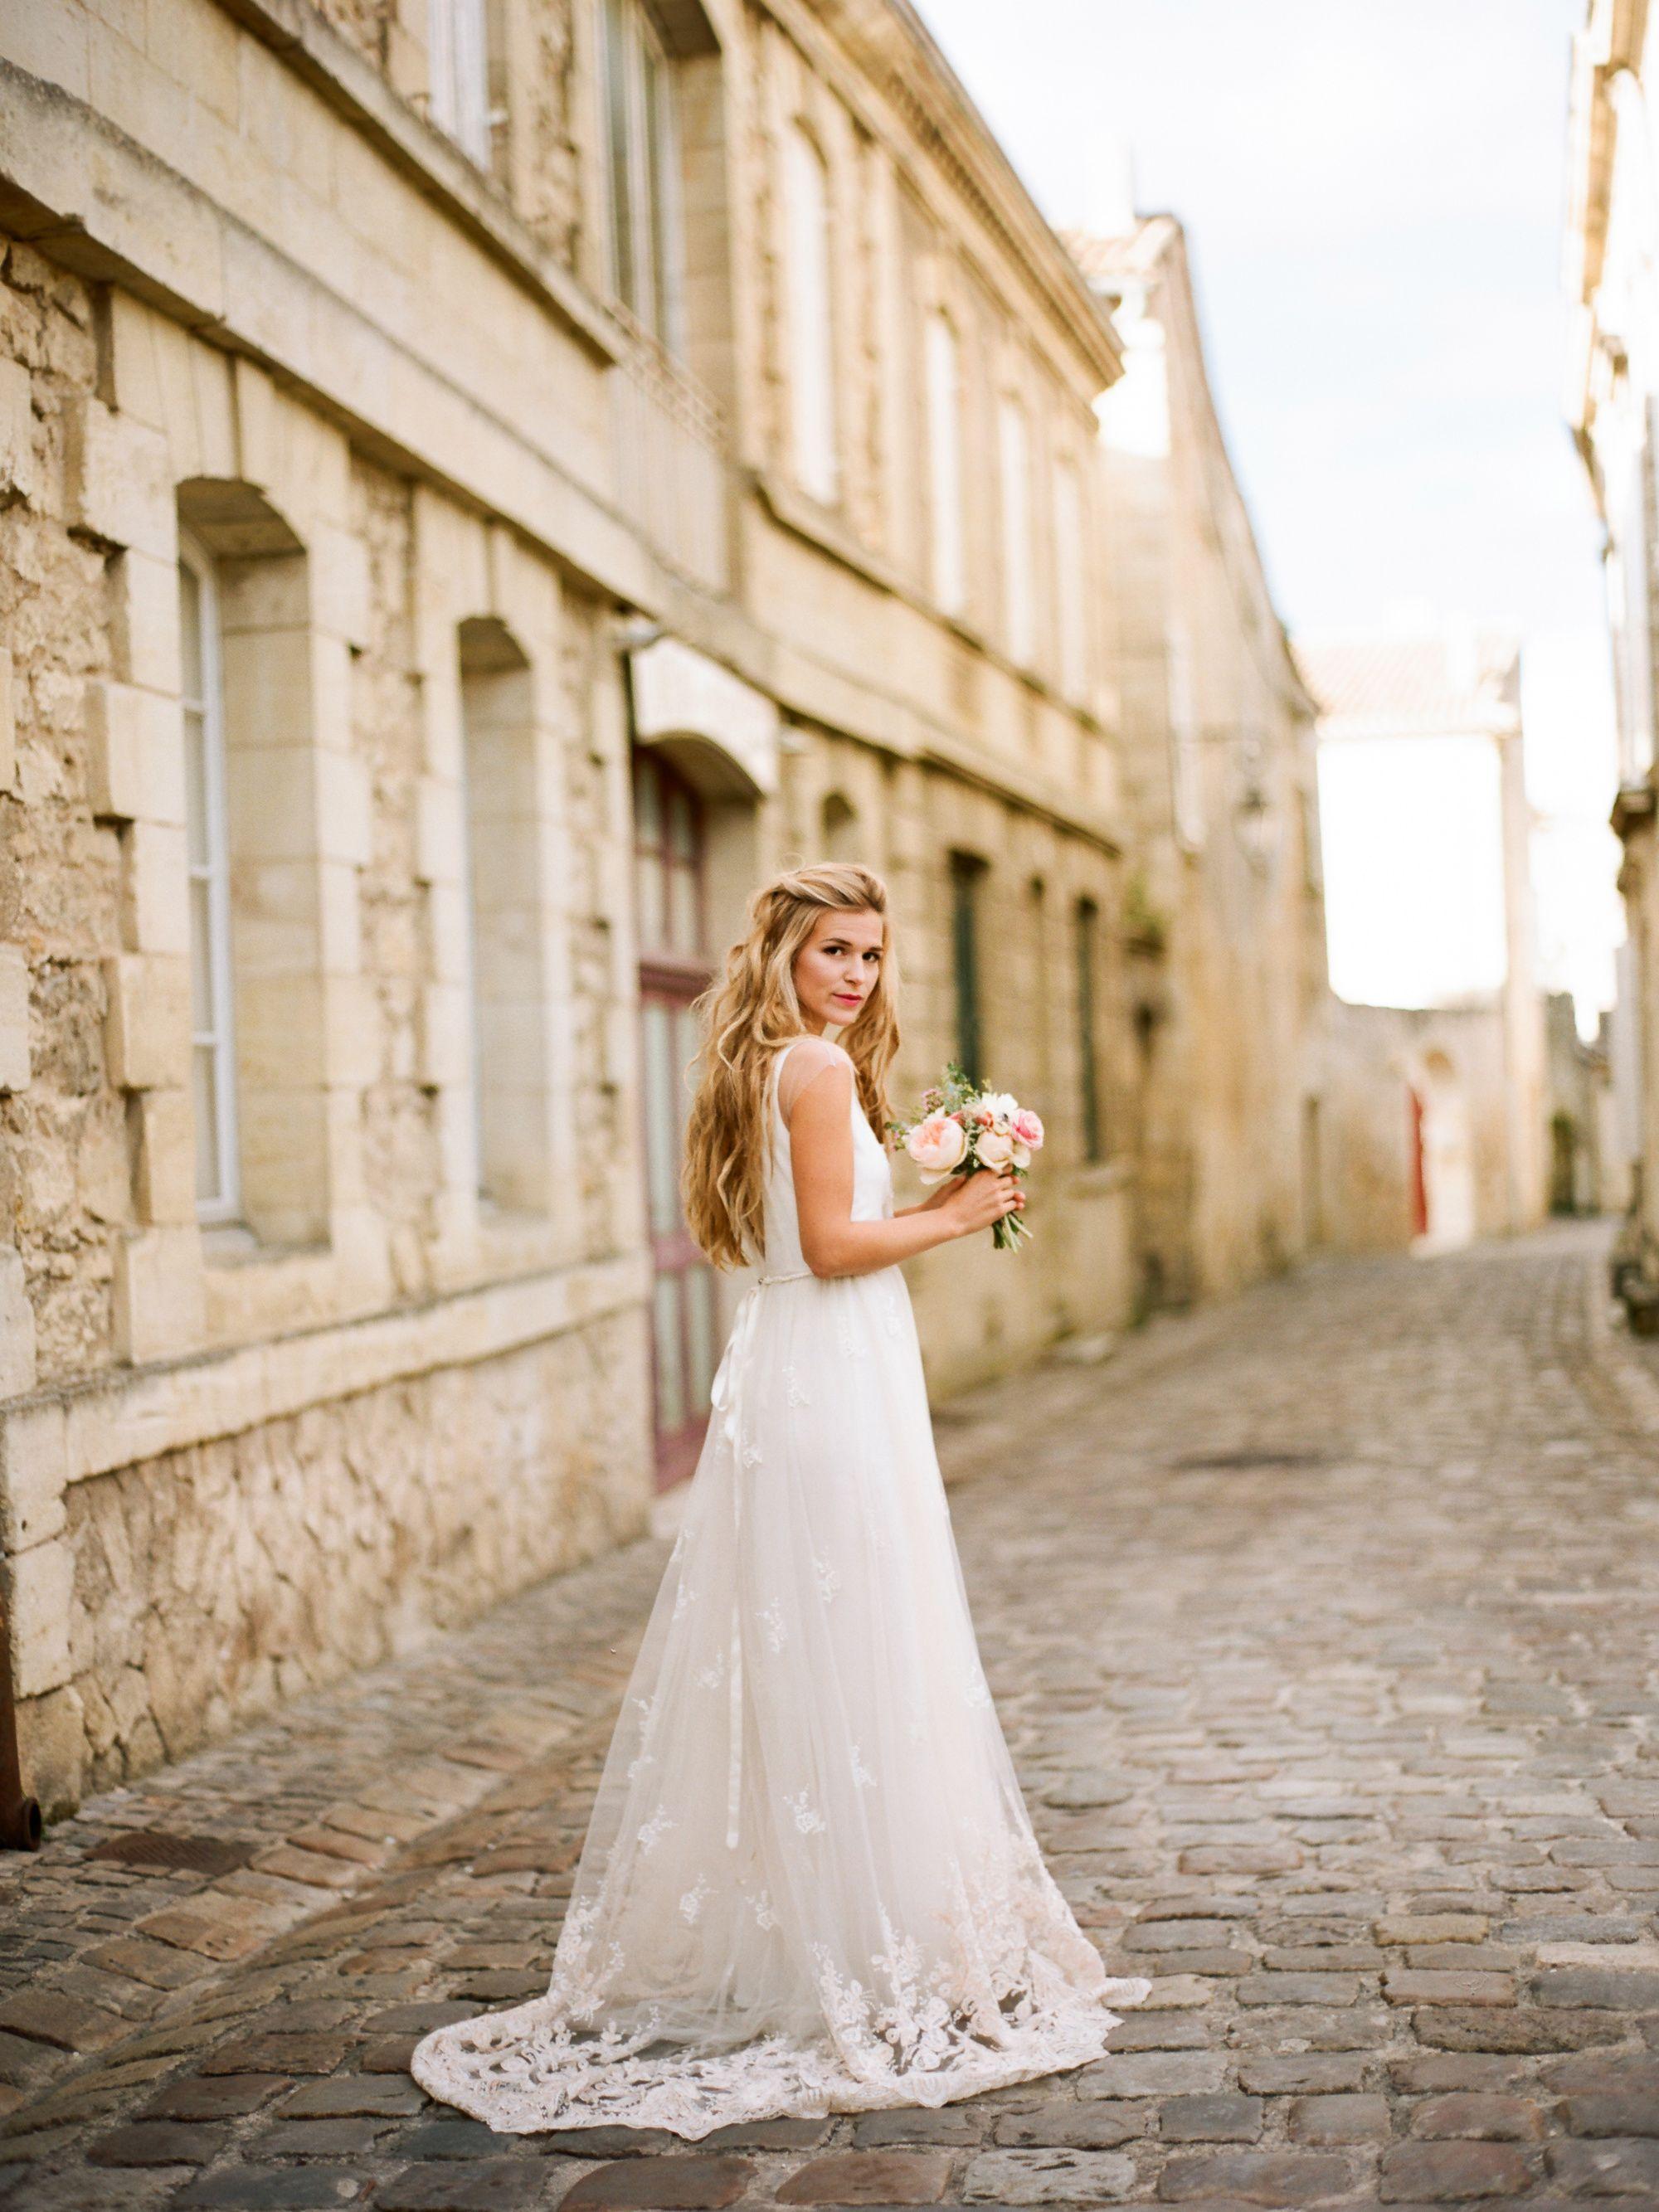 Pin by burcin kaleli on dress | Wedding dresses, 2016